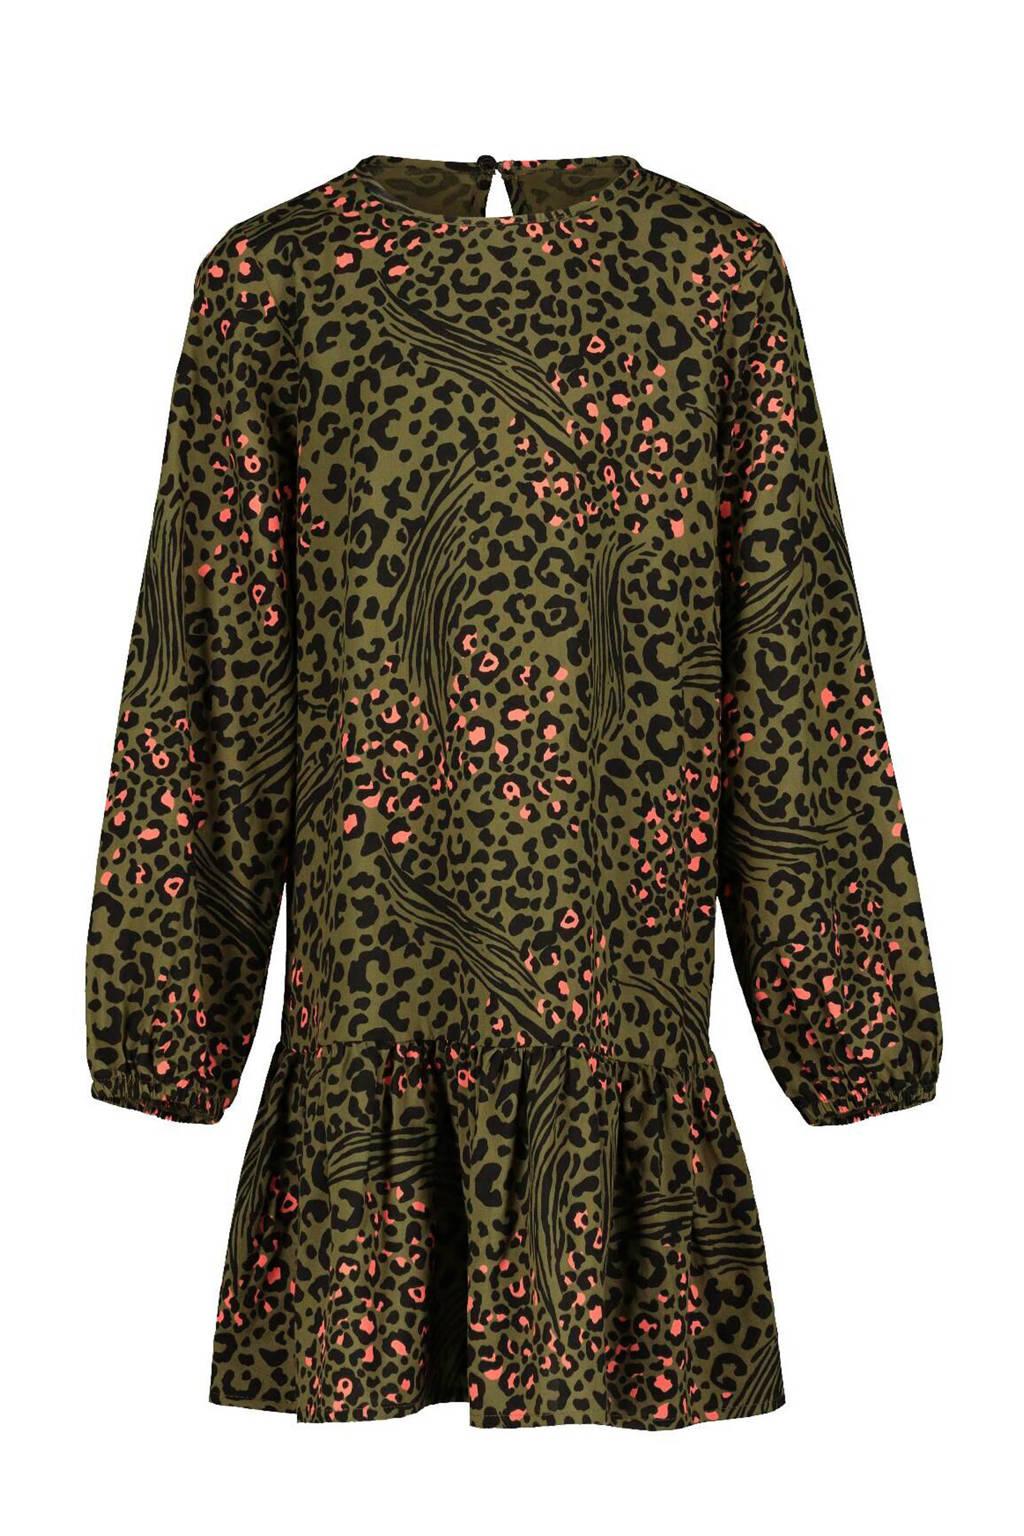 HEMA jurk Deloris met panterprint groen/zwart/roze, Groen/zwart/roze